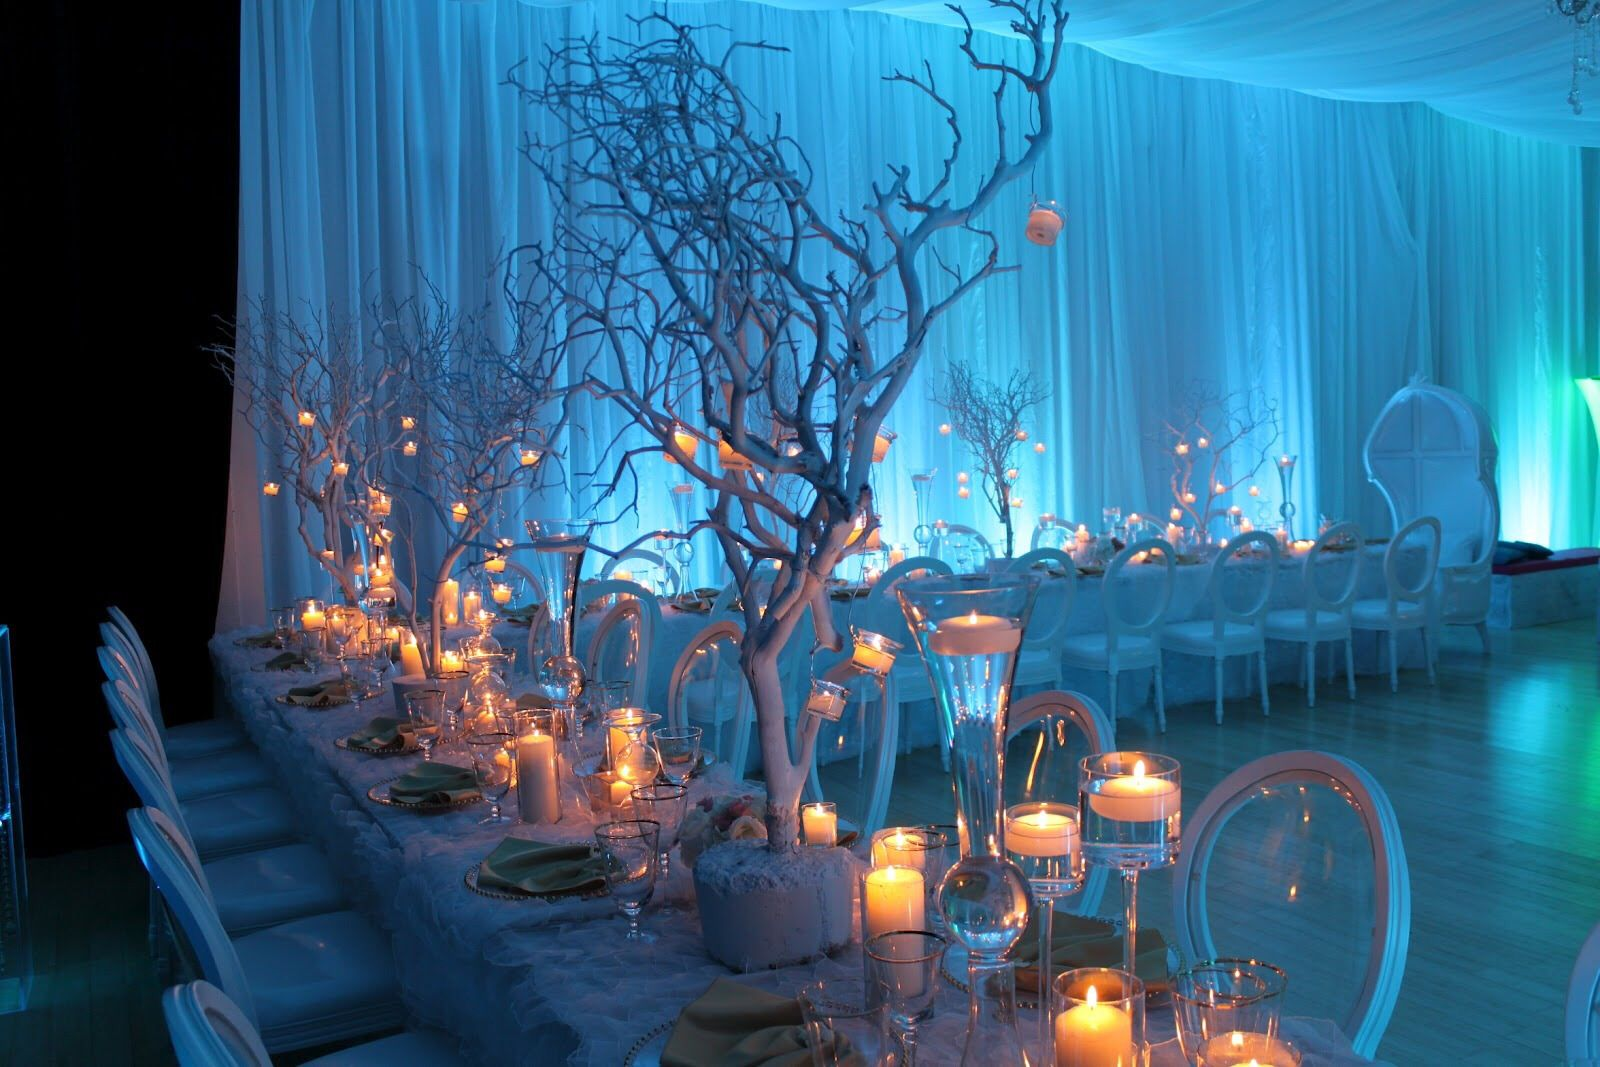 Decoration ideas for 40th wedding anniversary  Candles  Weddding ideas  Pinterest